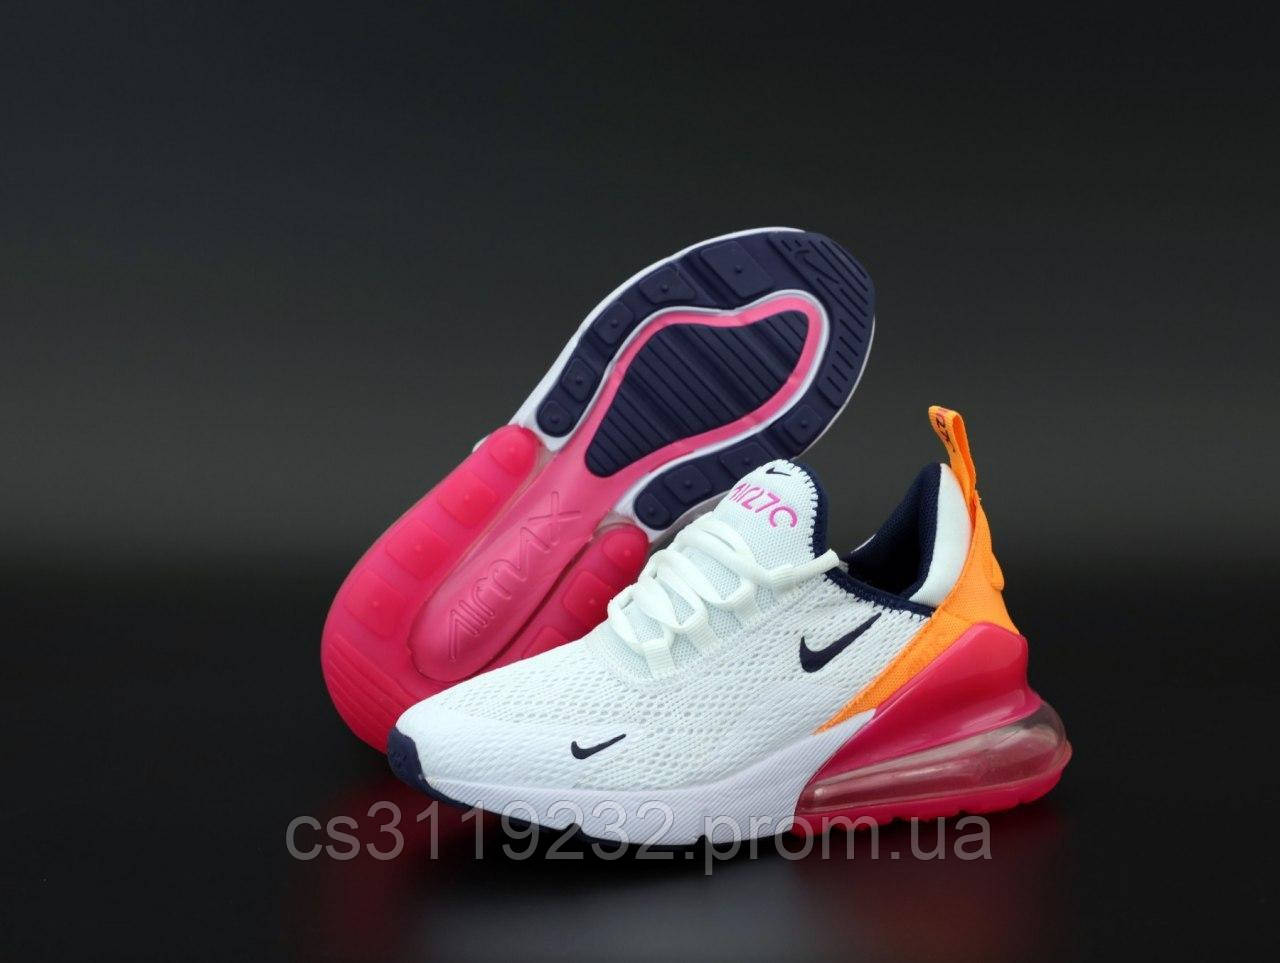 Женские кроссовки Nike Air Max 270 White Orange Pink (белые)